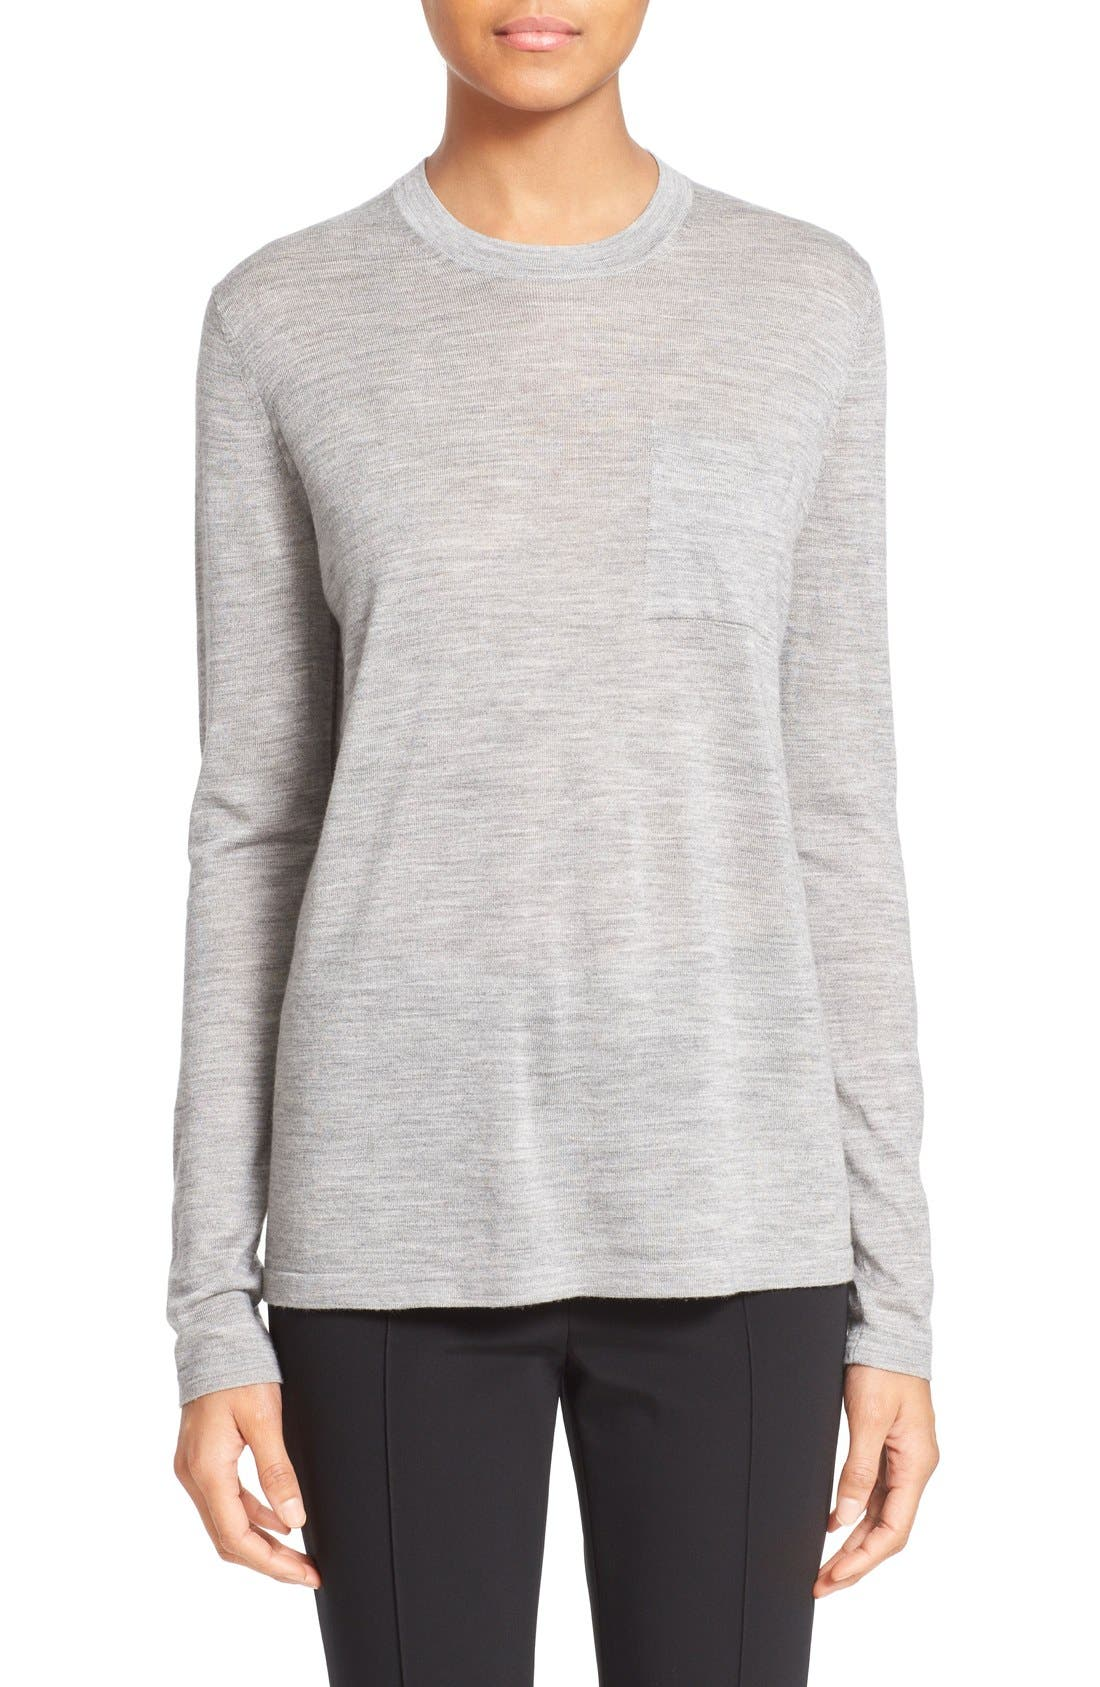 ALEXANDER WANG Wool & Silk Crewneck Sweater